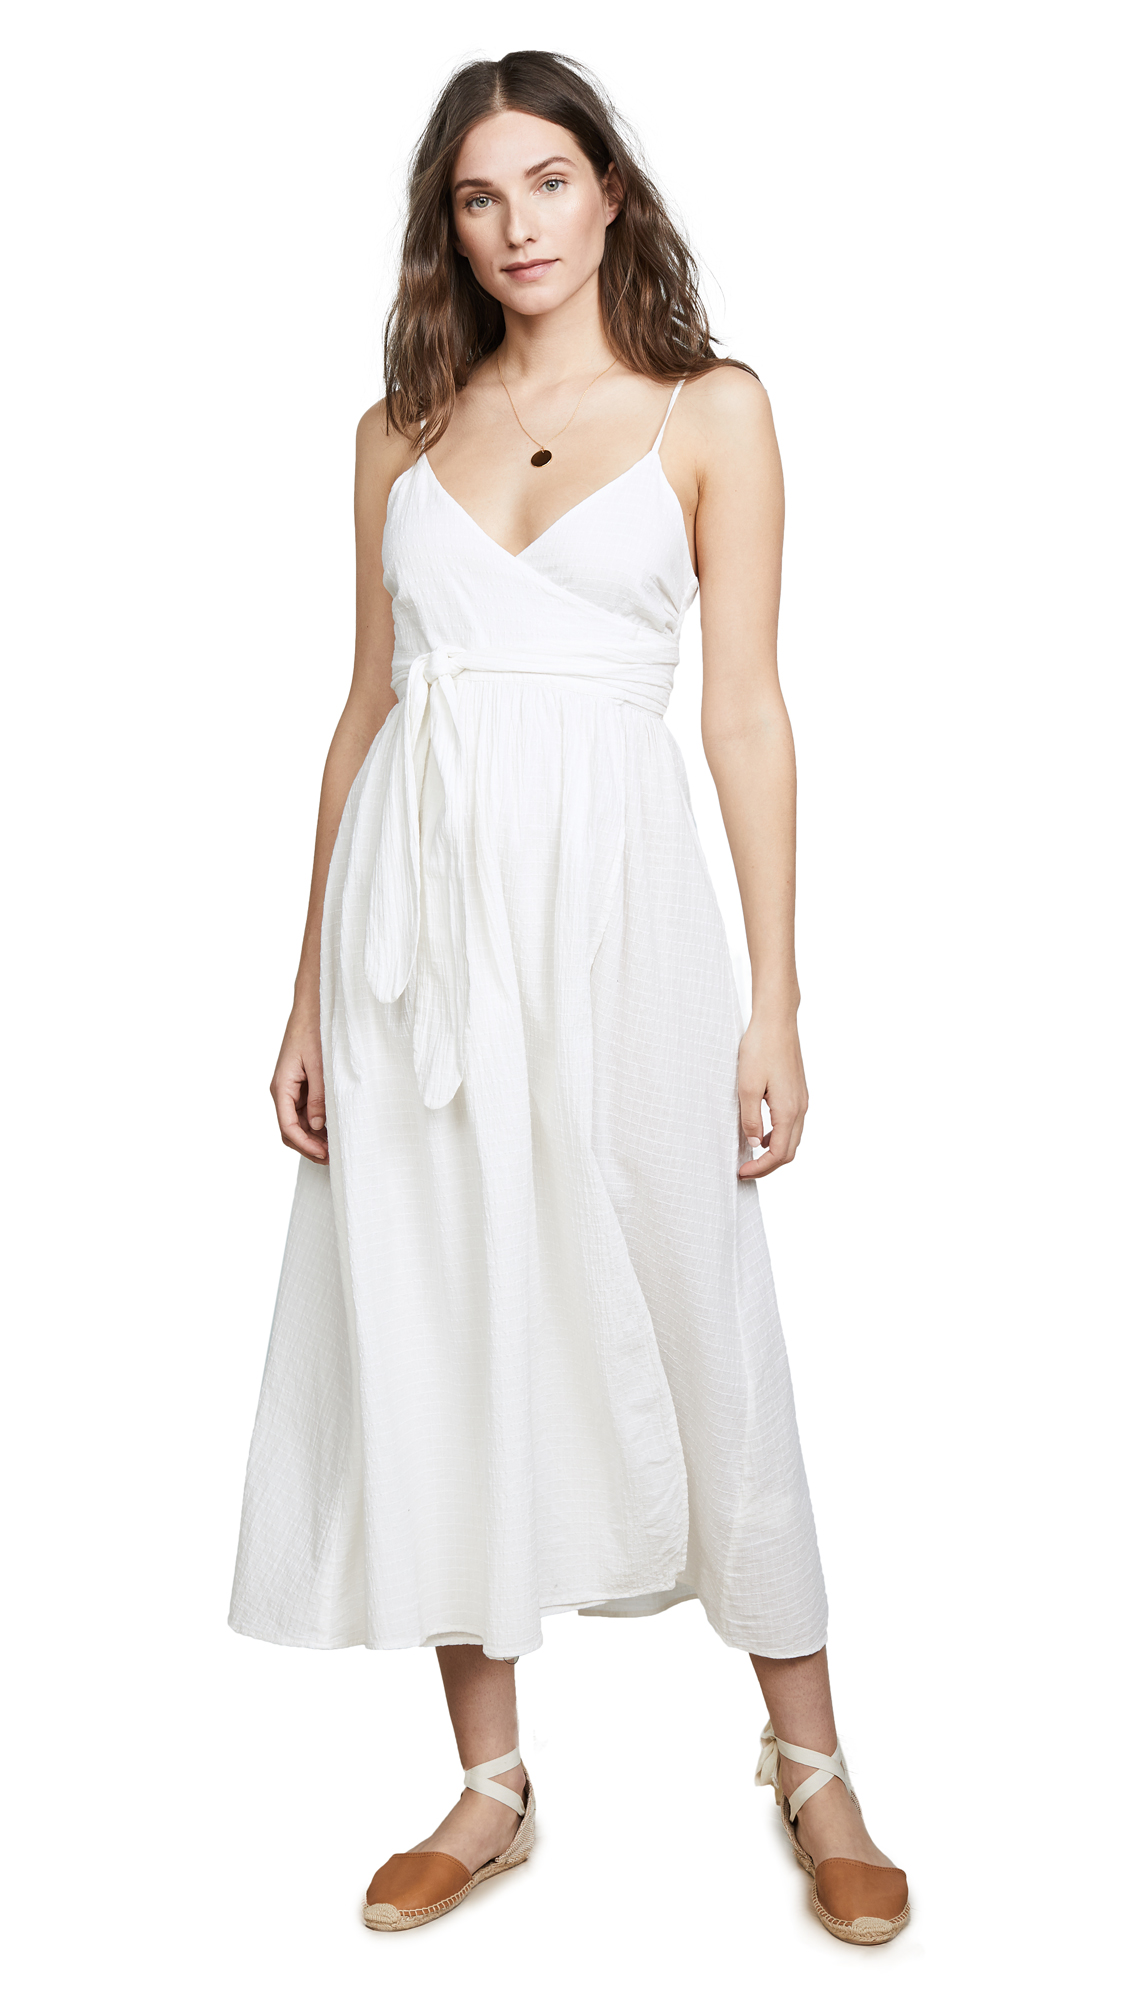 IVORY ALMA DRESS